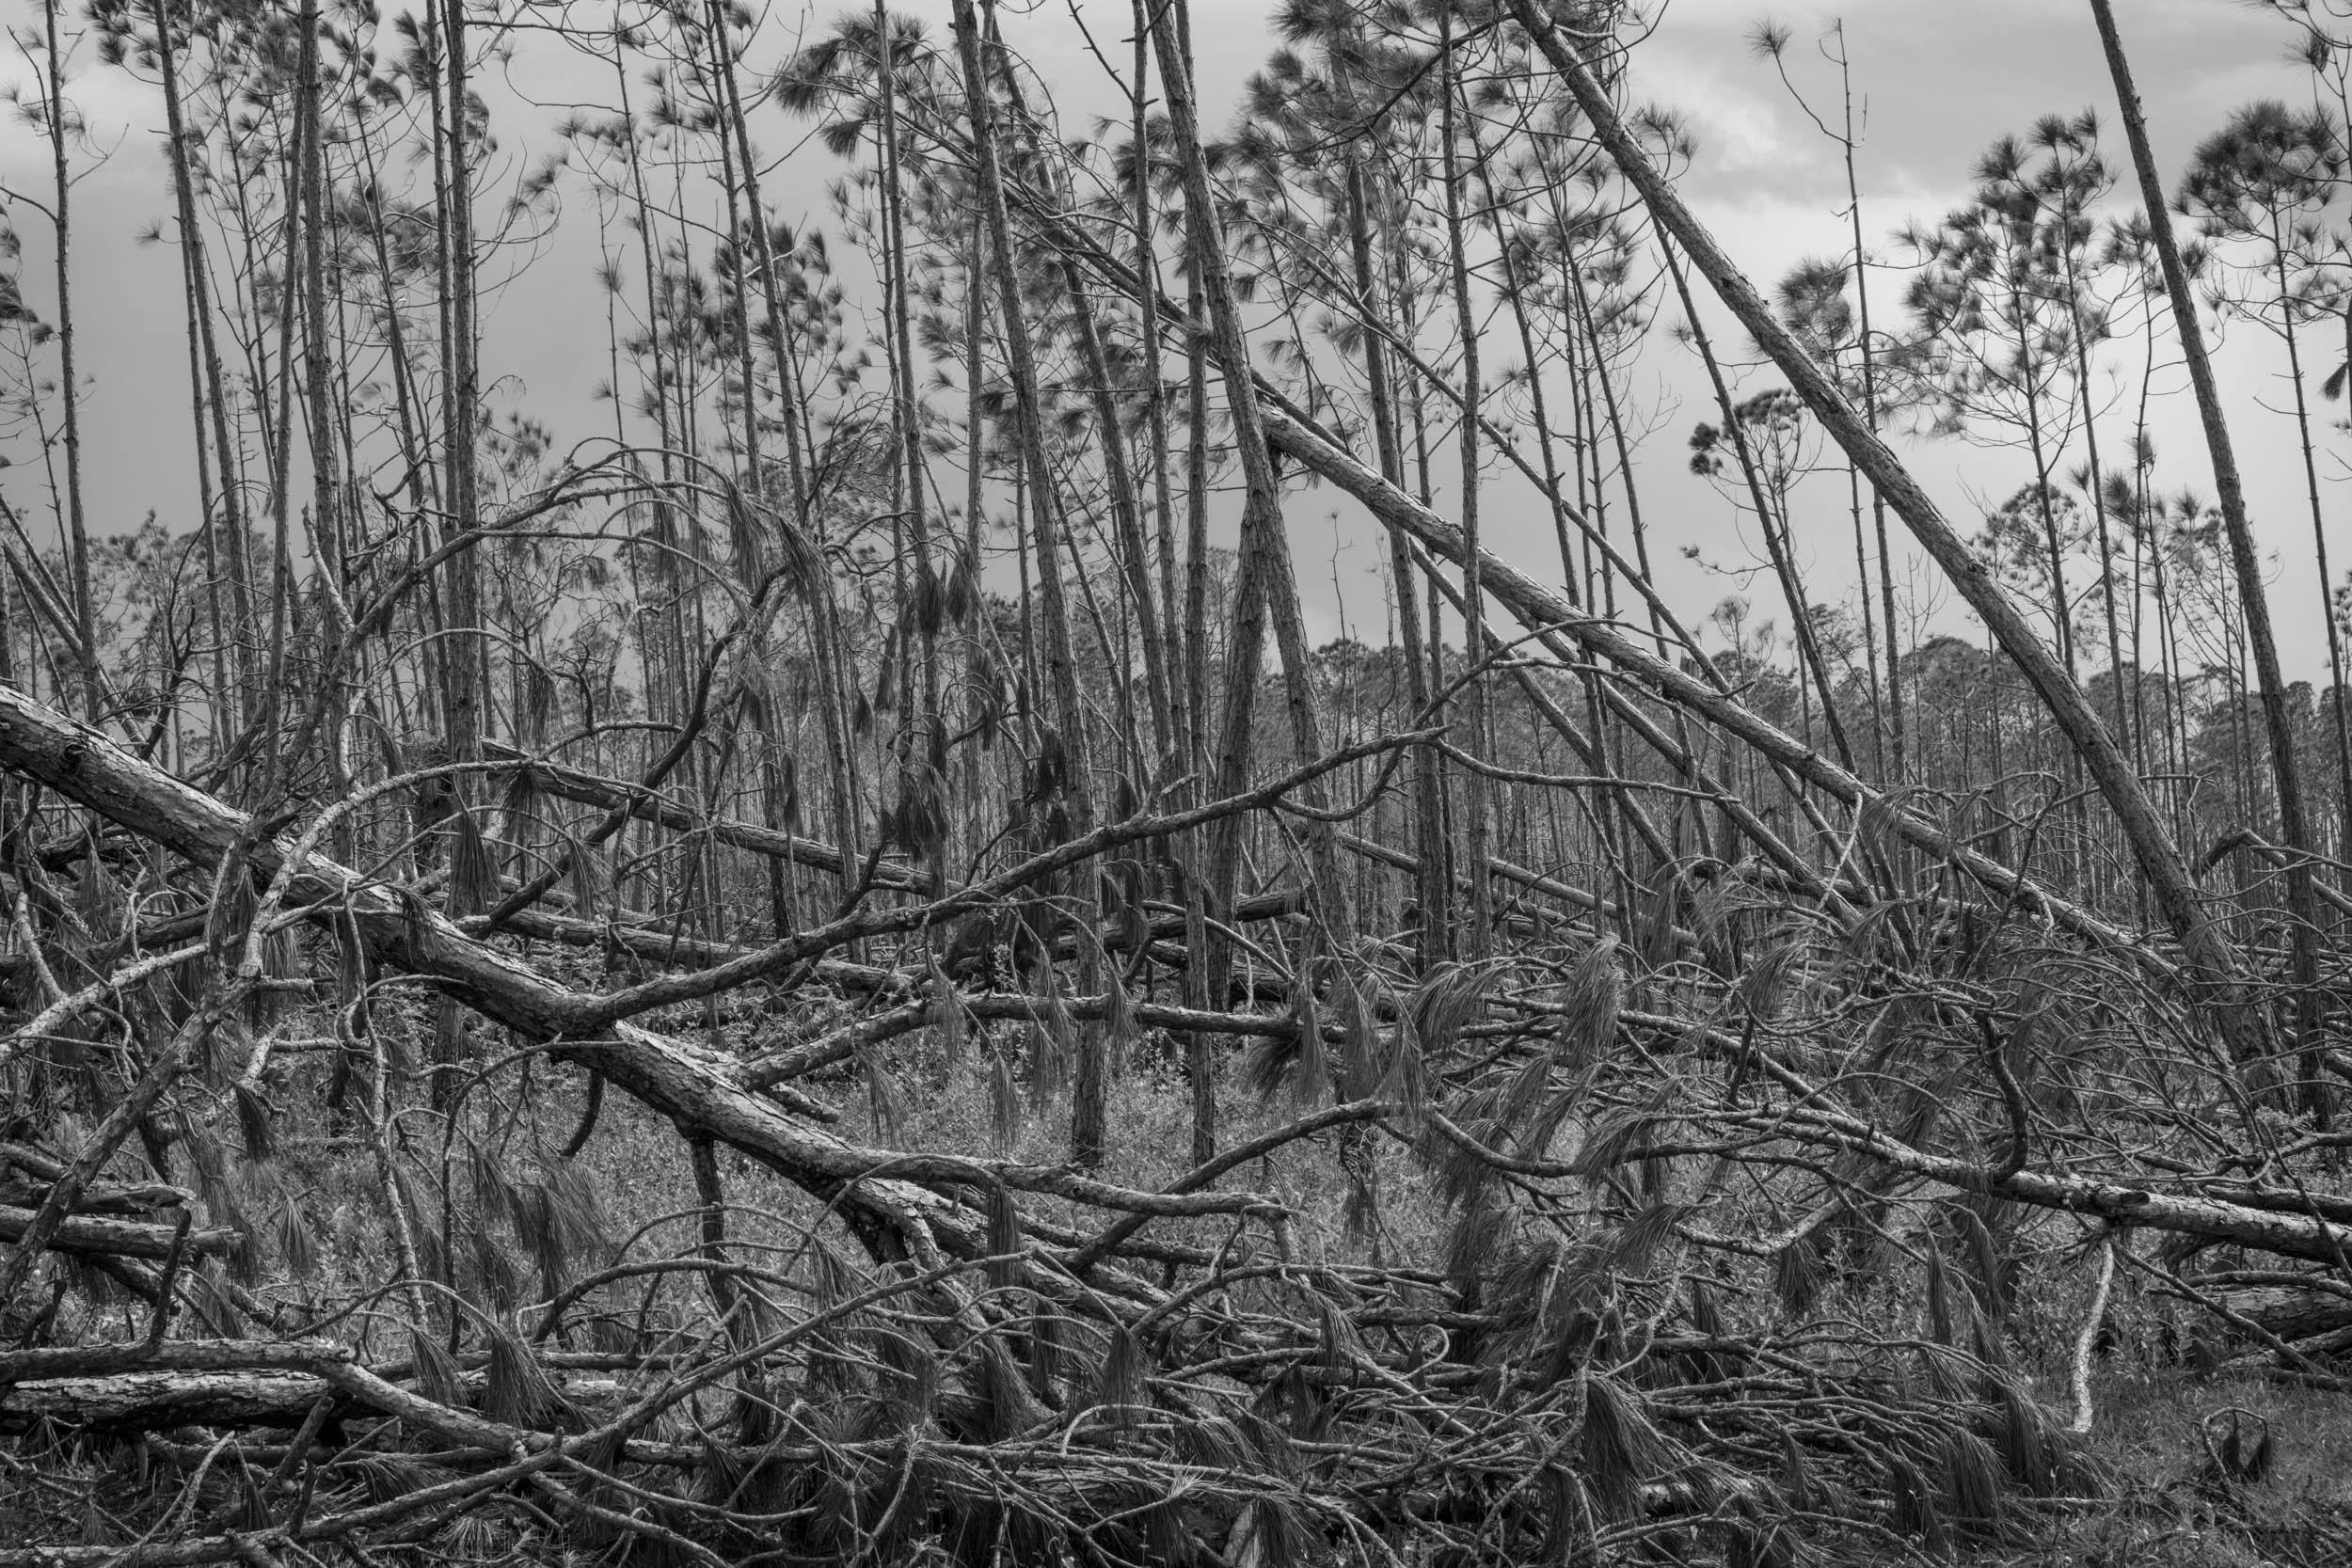 Fallen Branches